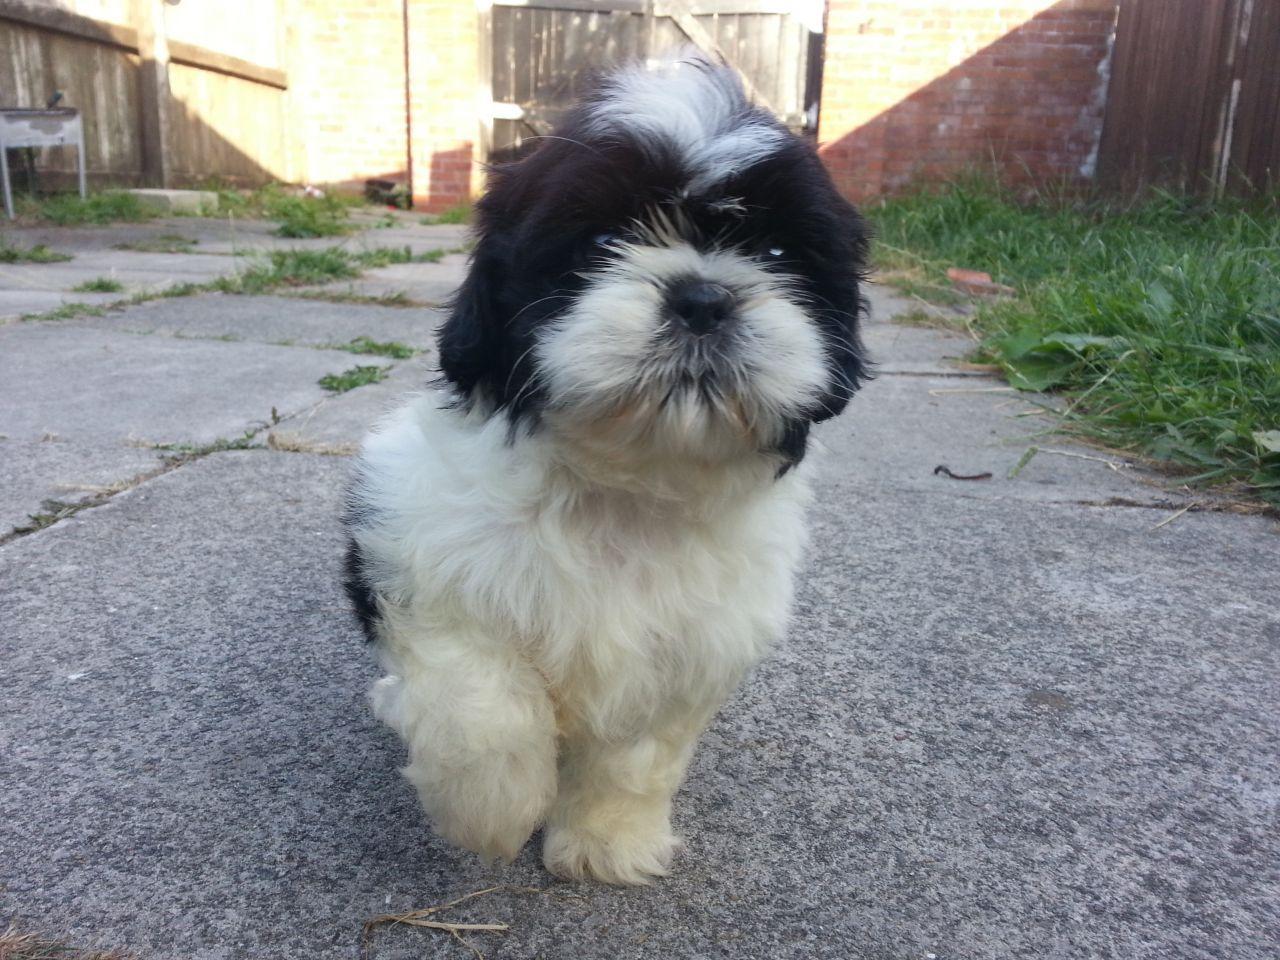 6 Shih Tzu Puppies With Images Shih Tzu Puppy Shih Tzu Puppies